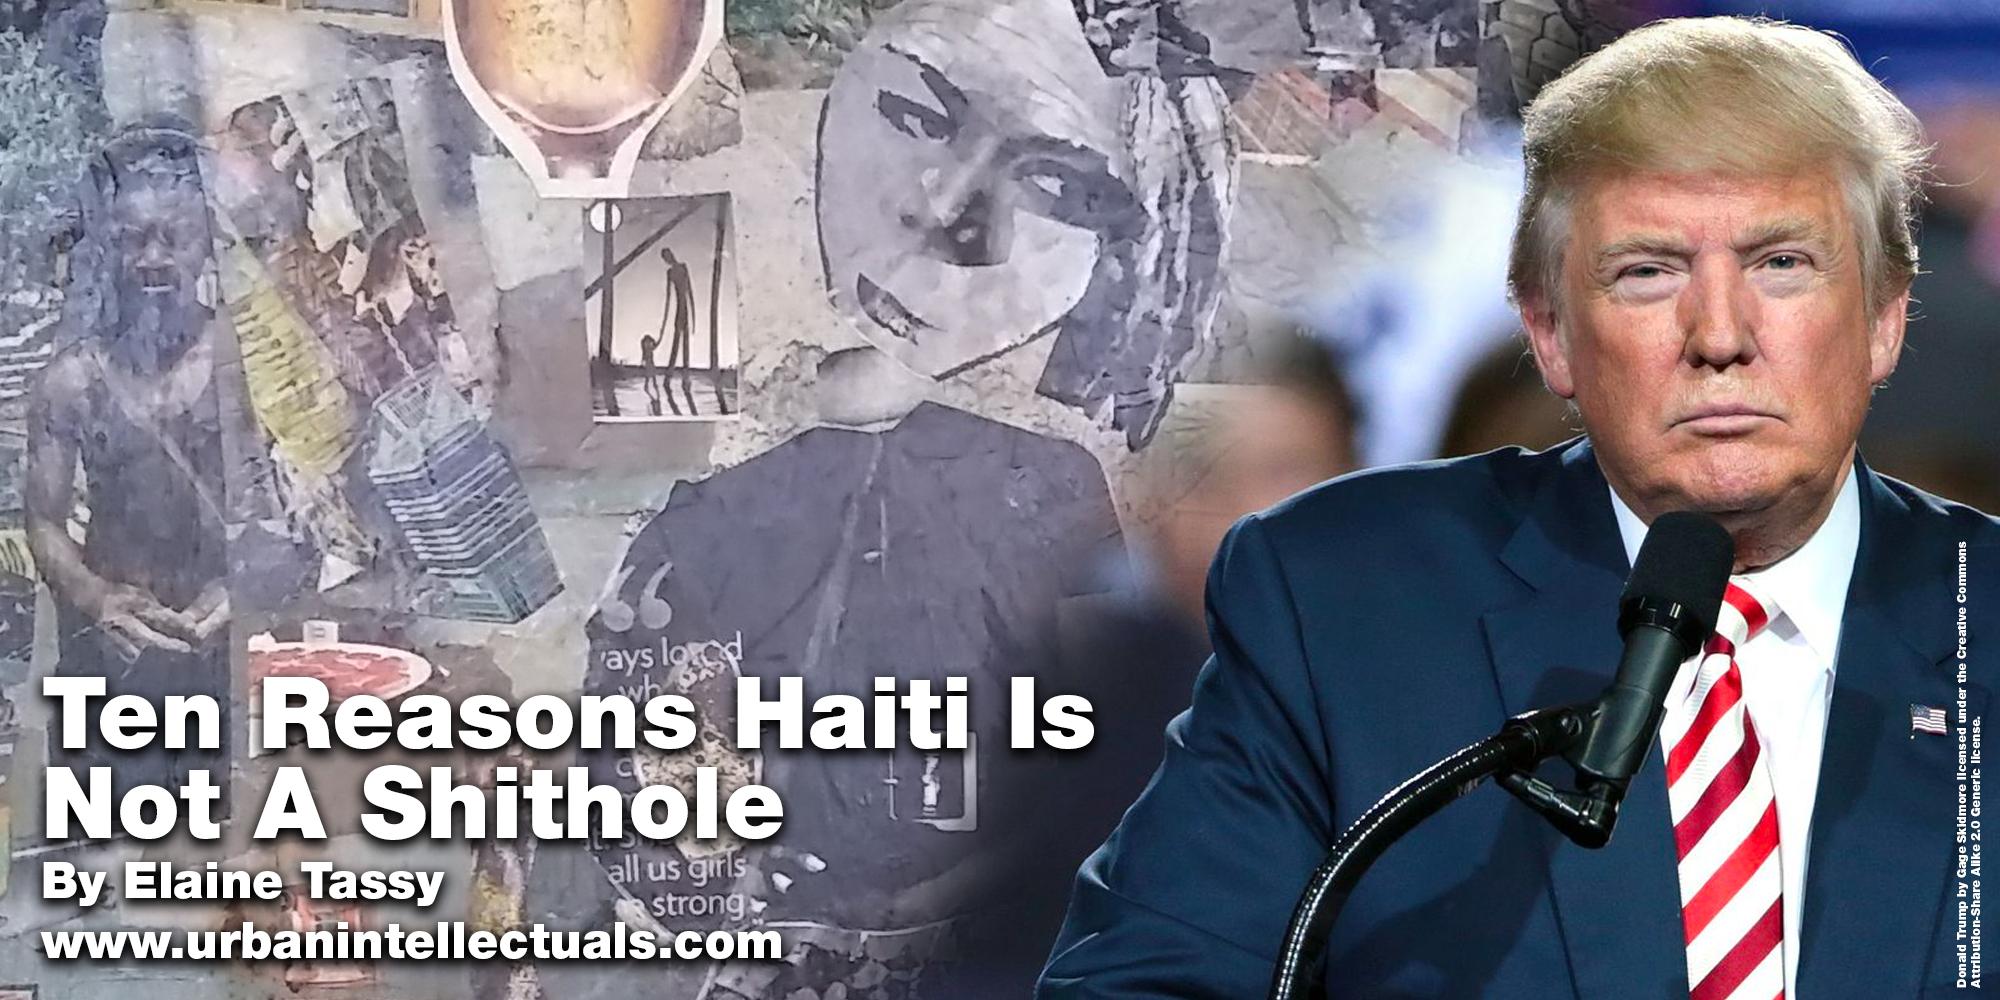 Ten Reasons Haiti Is Not A Shithole